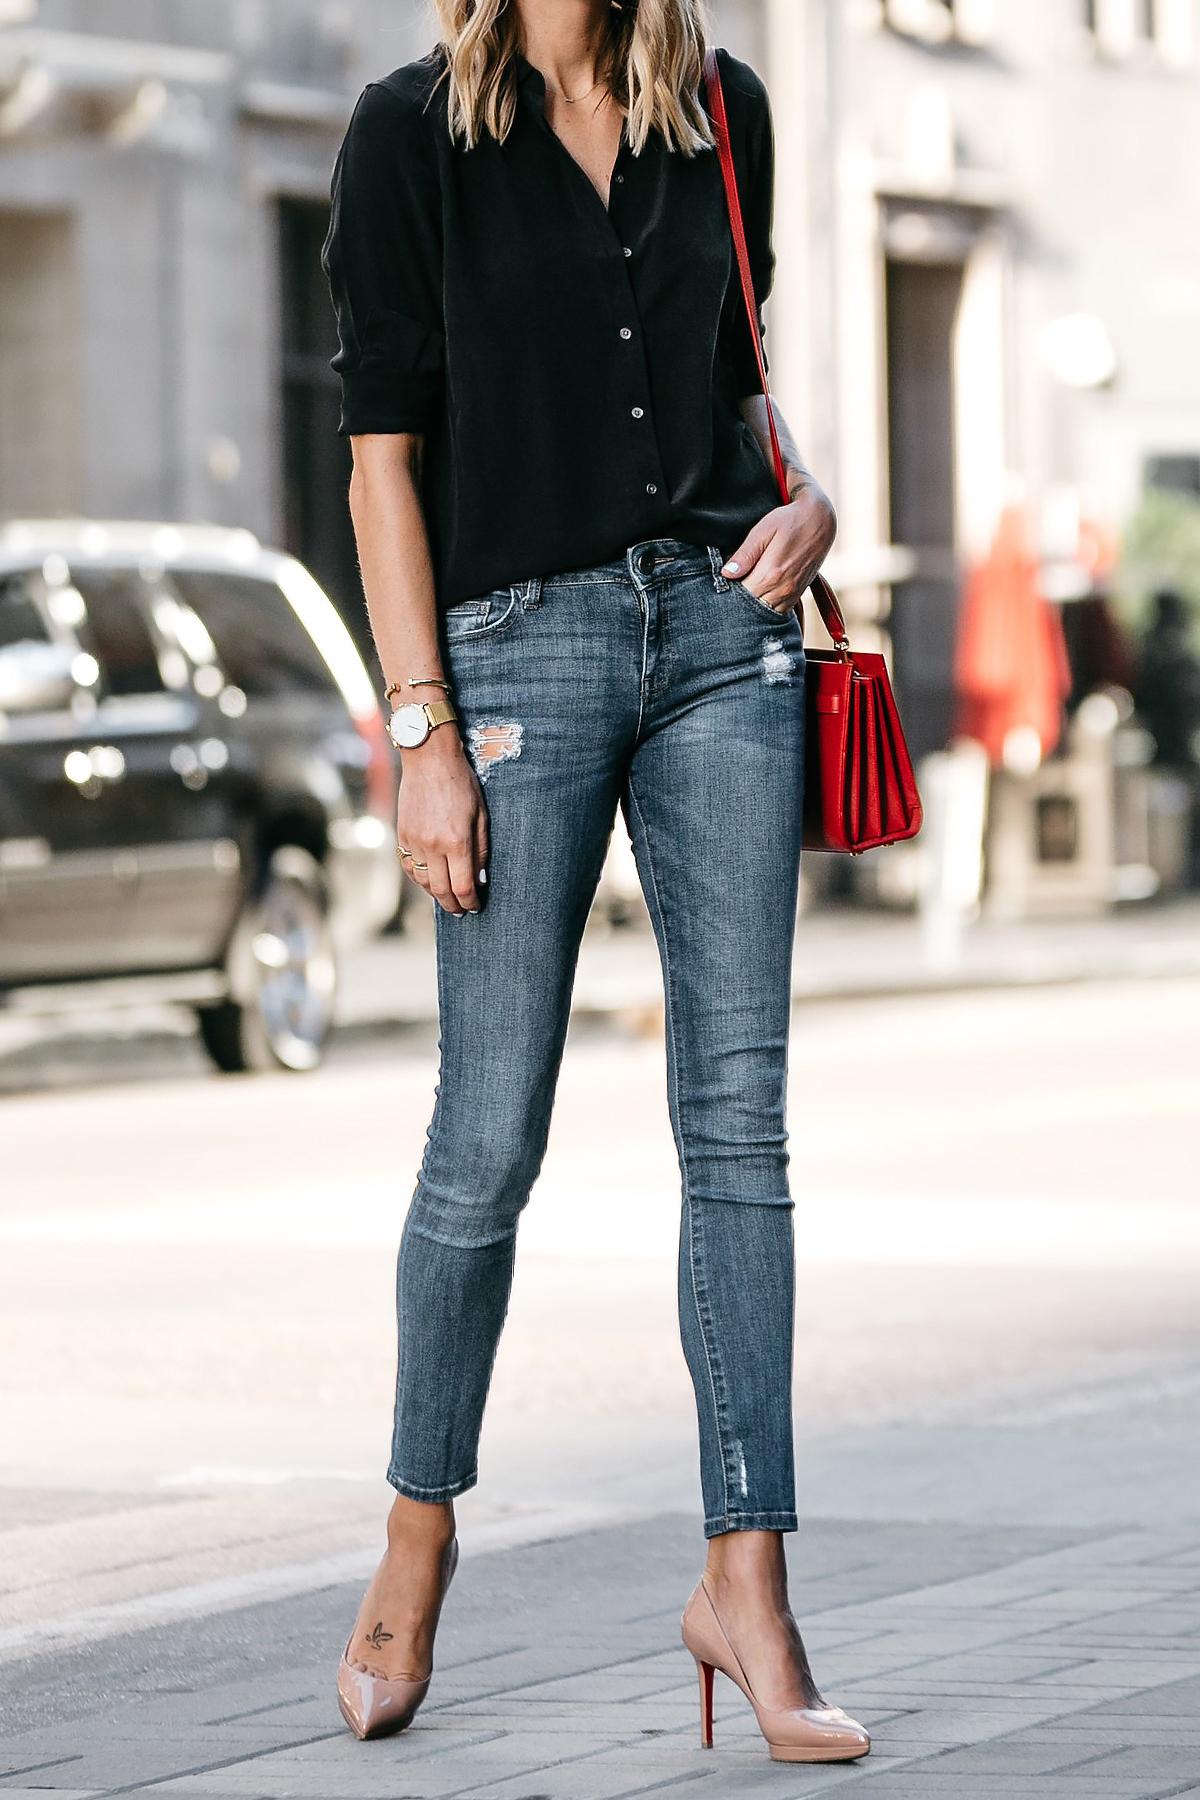 Everlane Black Button Up Shirt Denim Skinny Jeans Outfit Christian Louboutin Nude Pumps Red Handbag Fashion Jackson Dallas Blogger Fashion Blogger Street Style